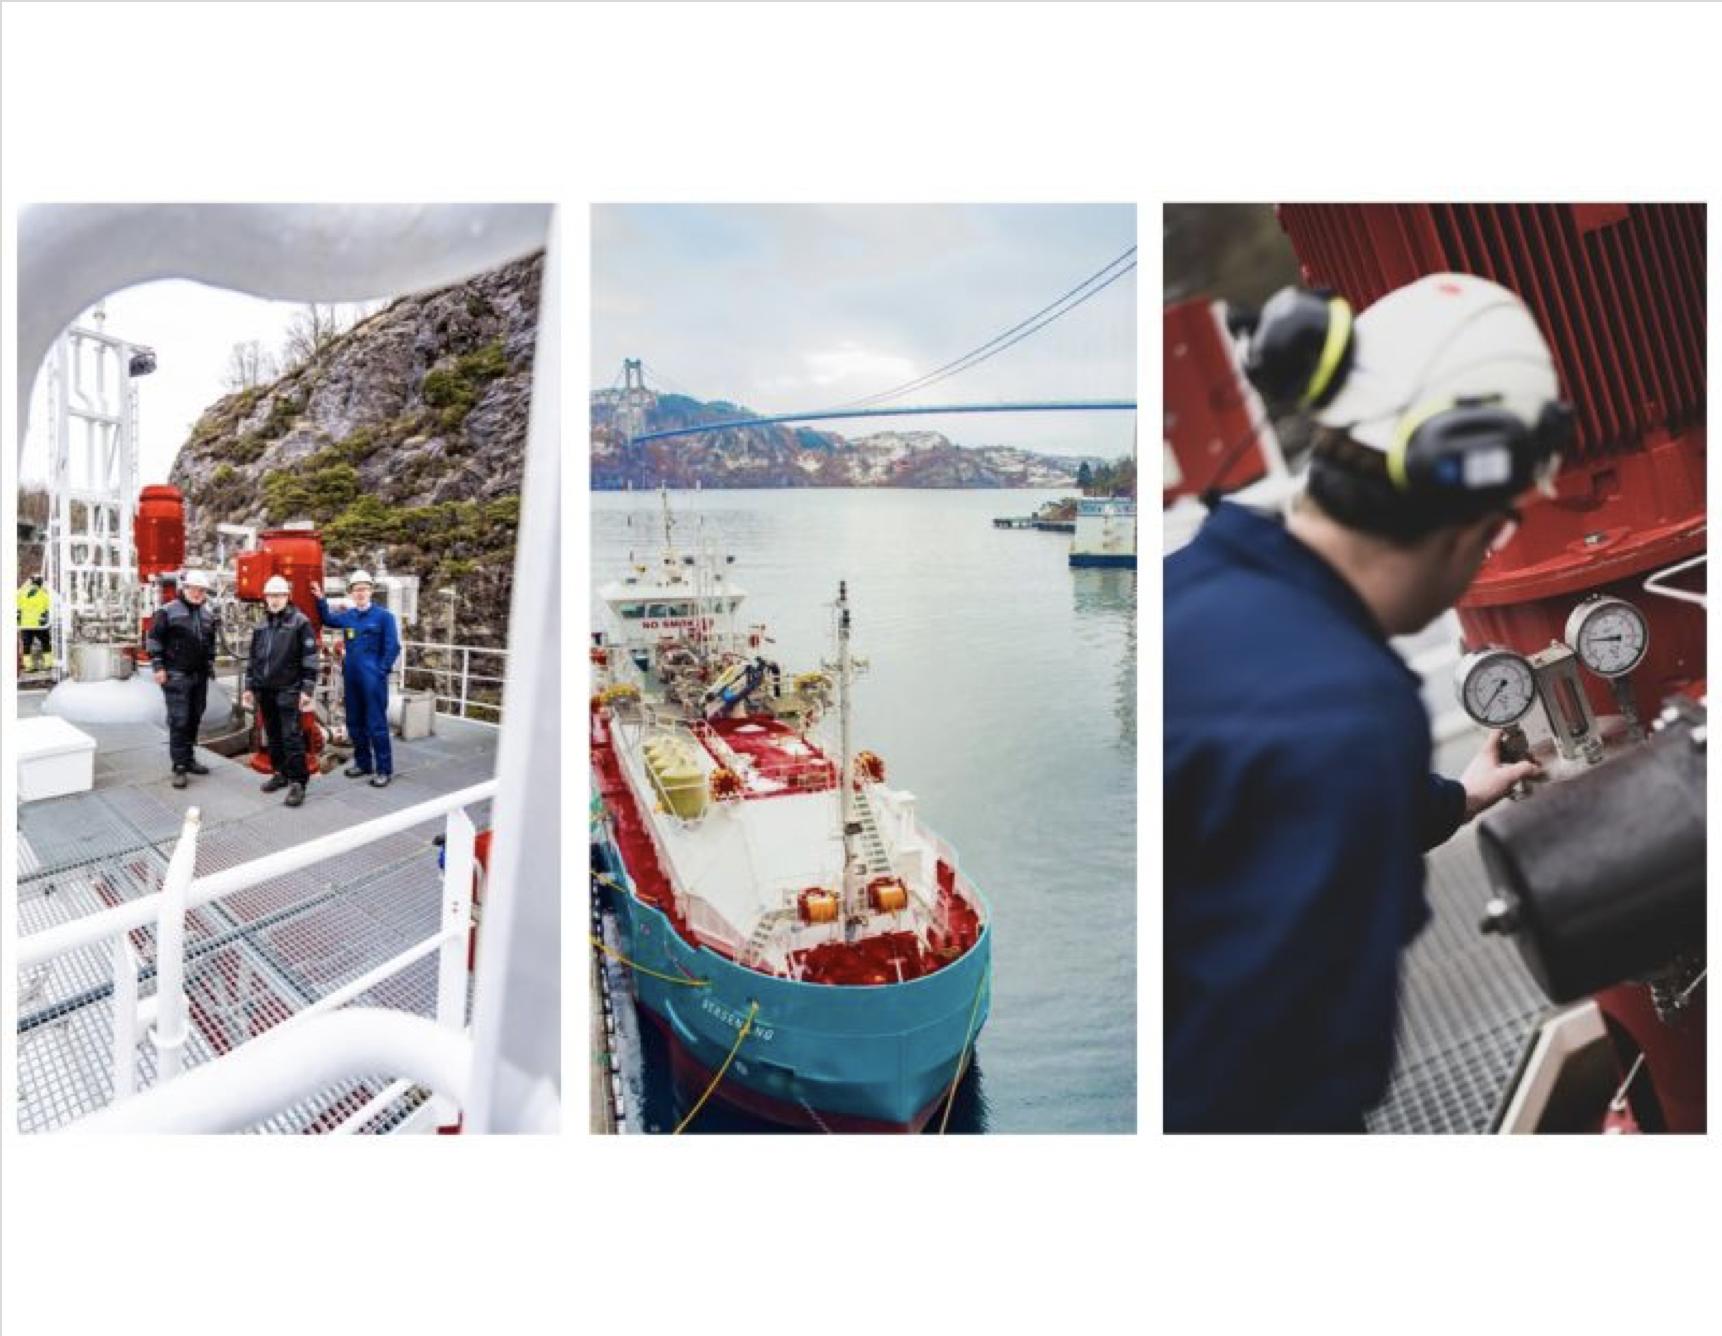 Høglund successfully retrofits LNG bunkering tech on 'Bergen LNG' tanker